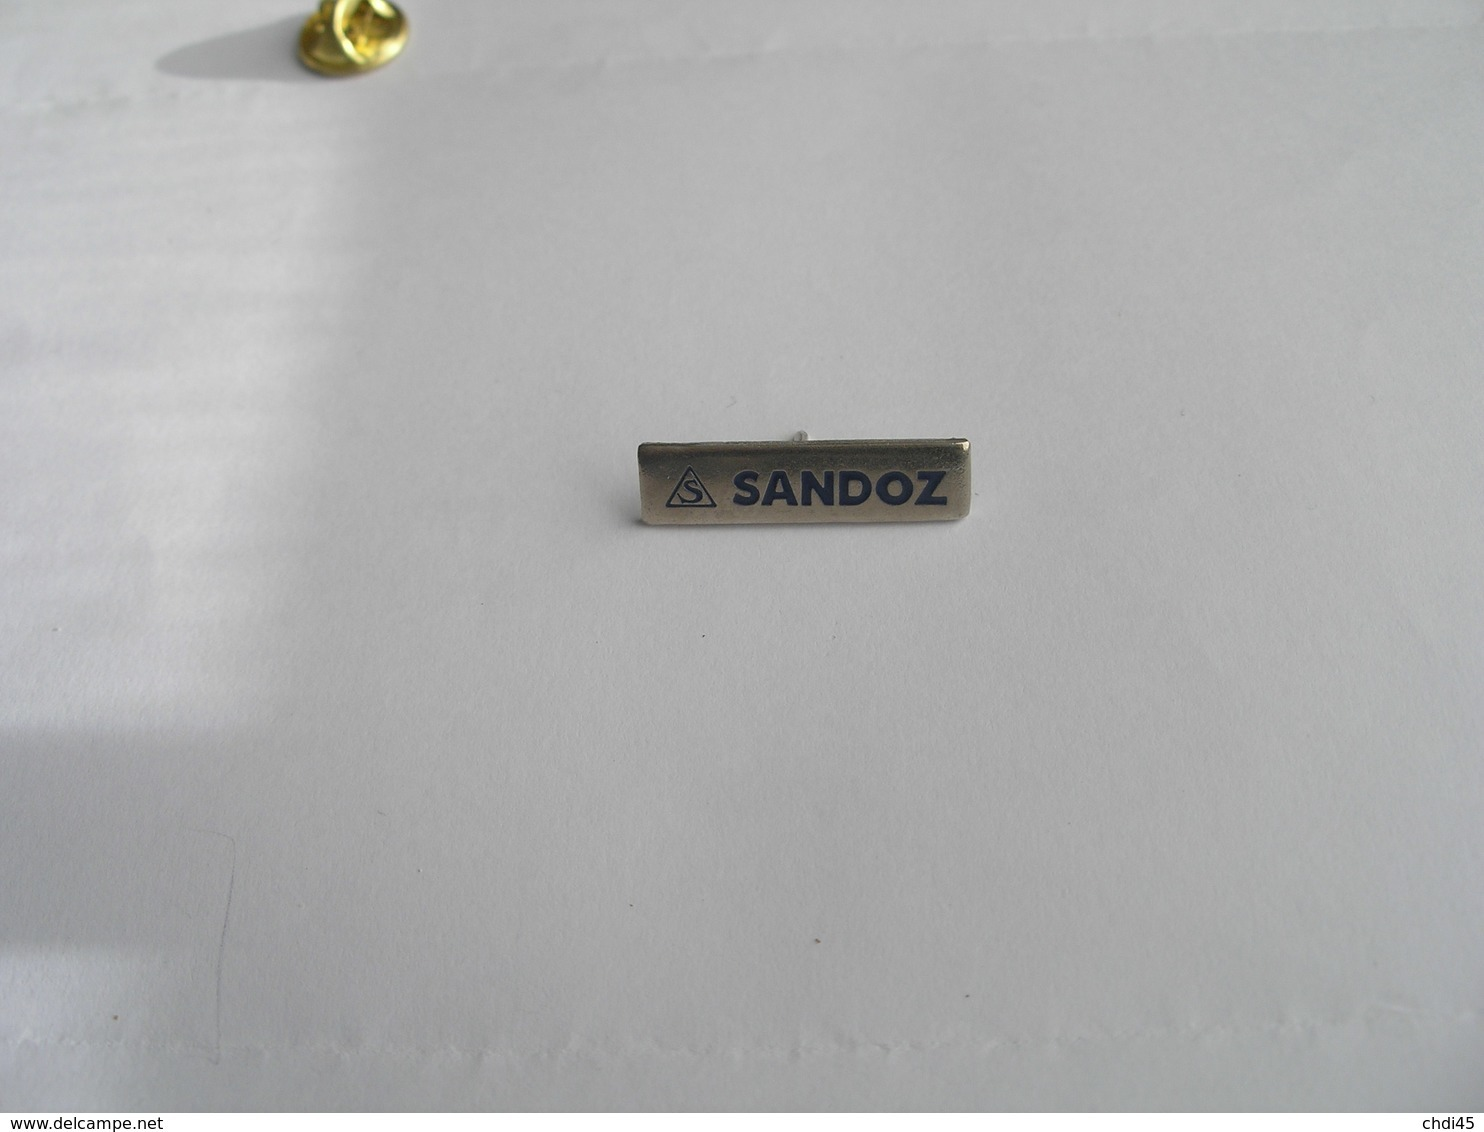 SANDOZ - Medical